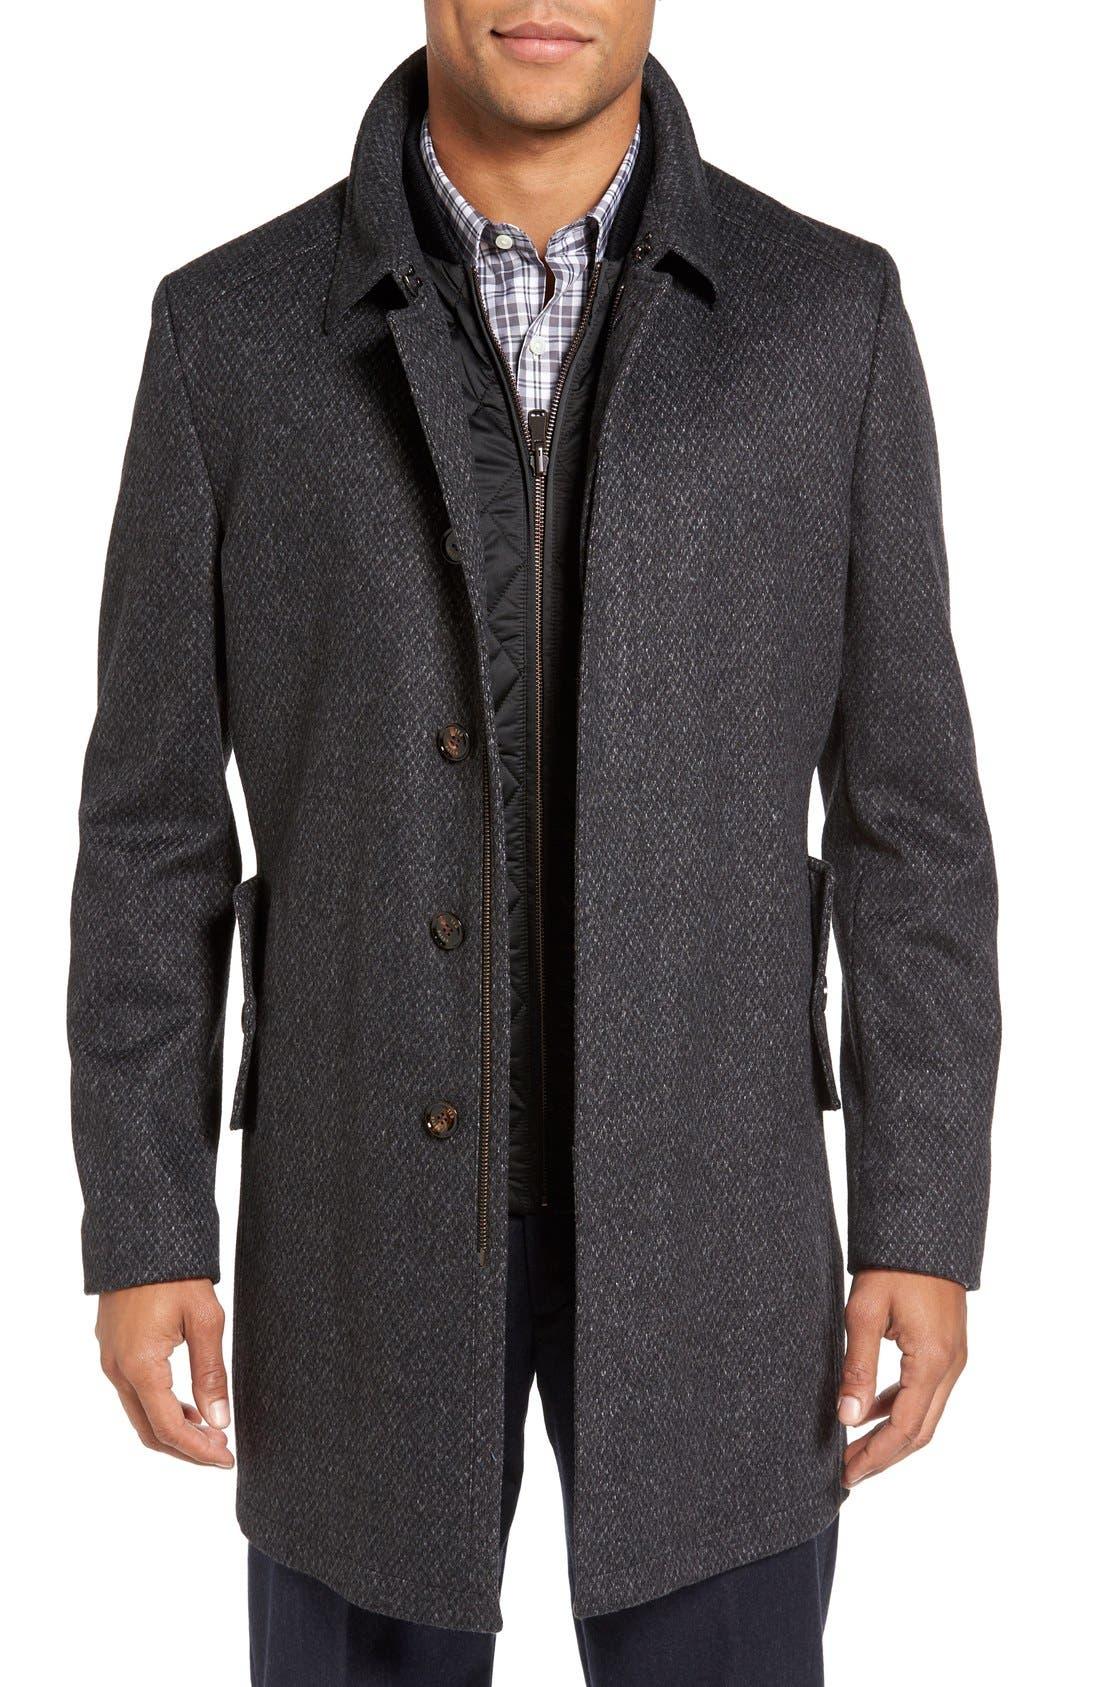 Main Image - Ted Baker London Arizona Wool Blend Overcoat